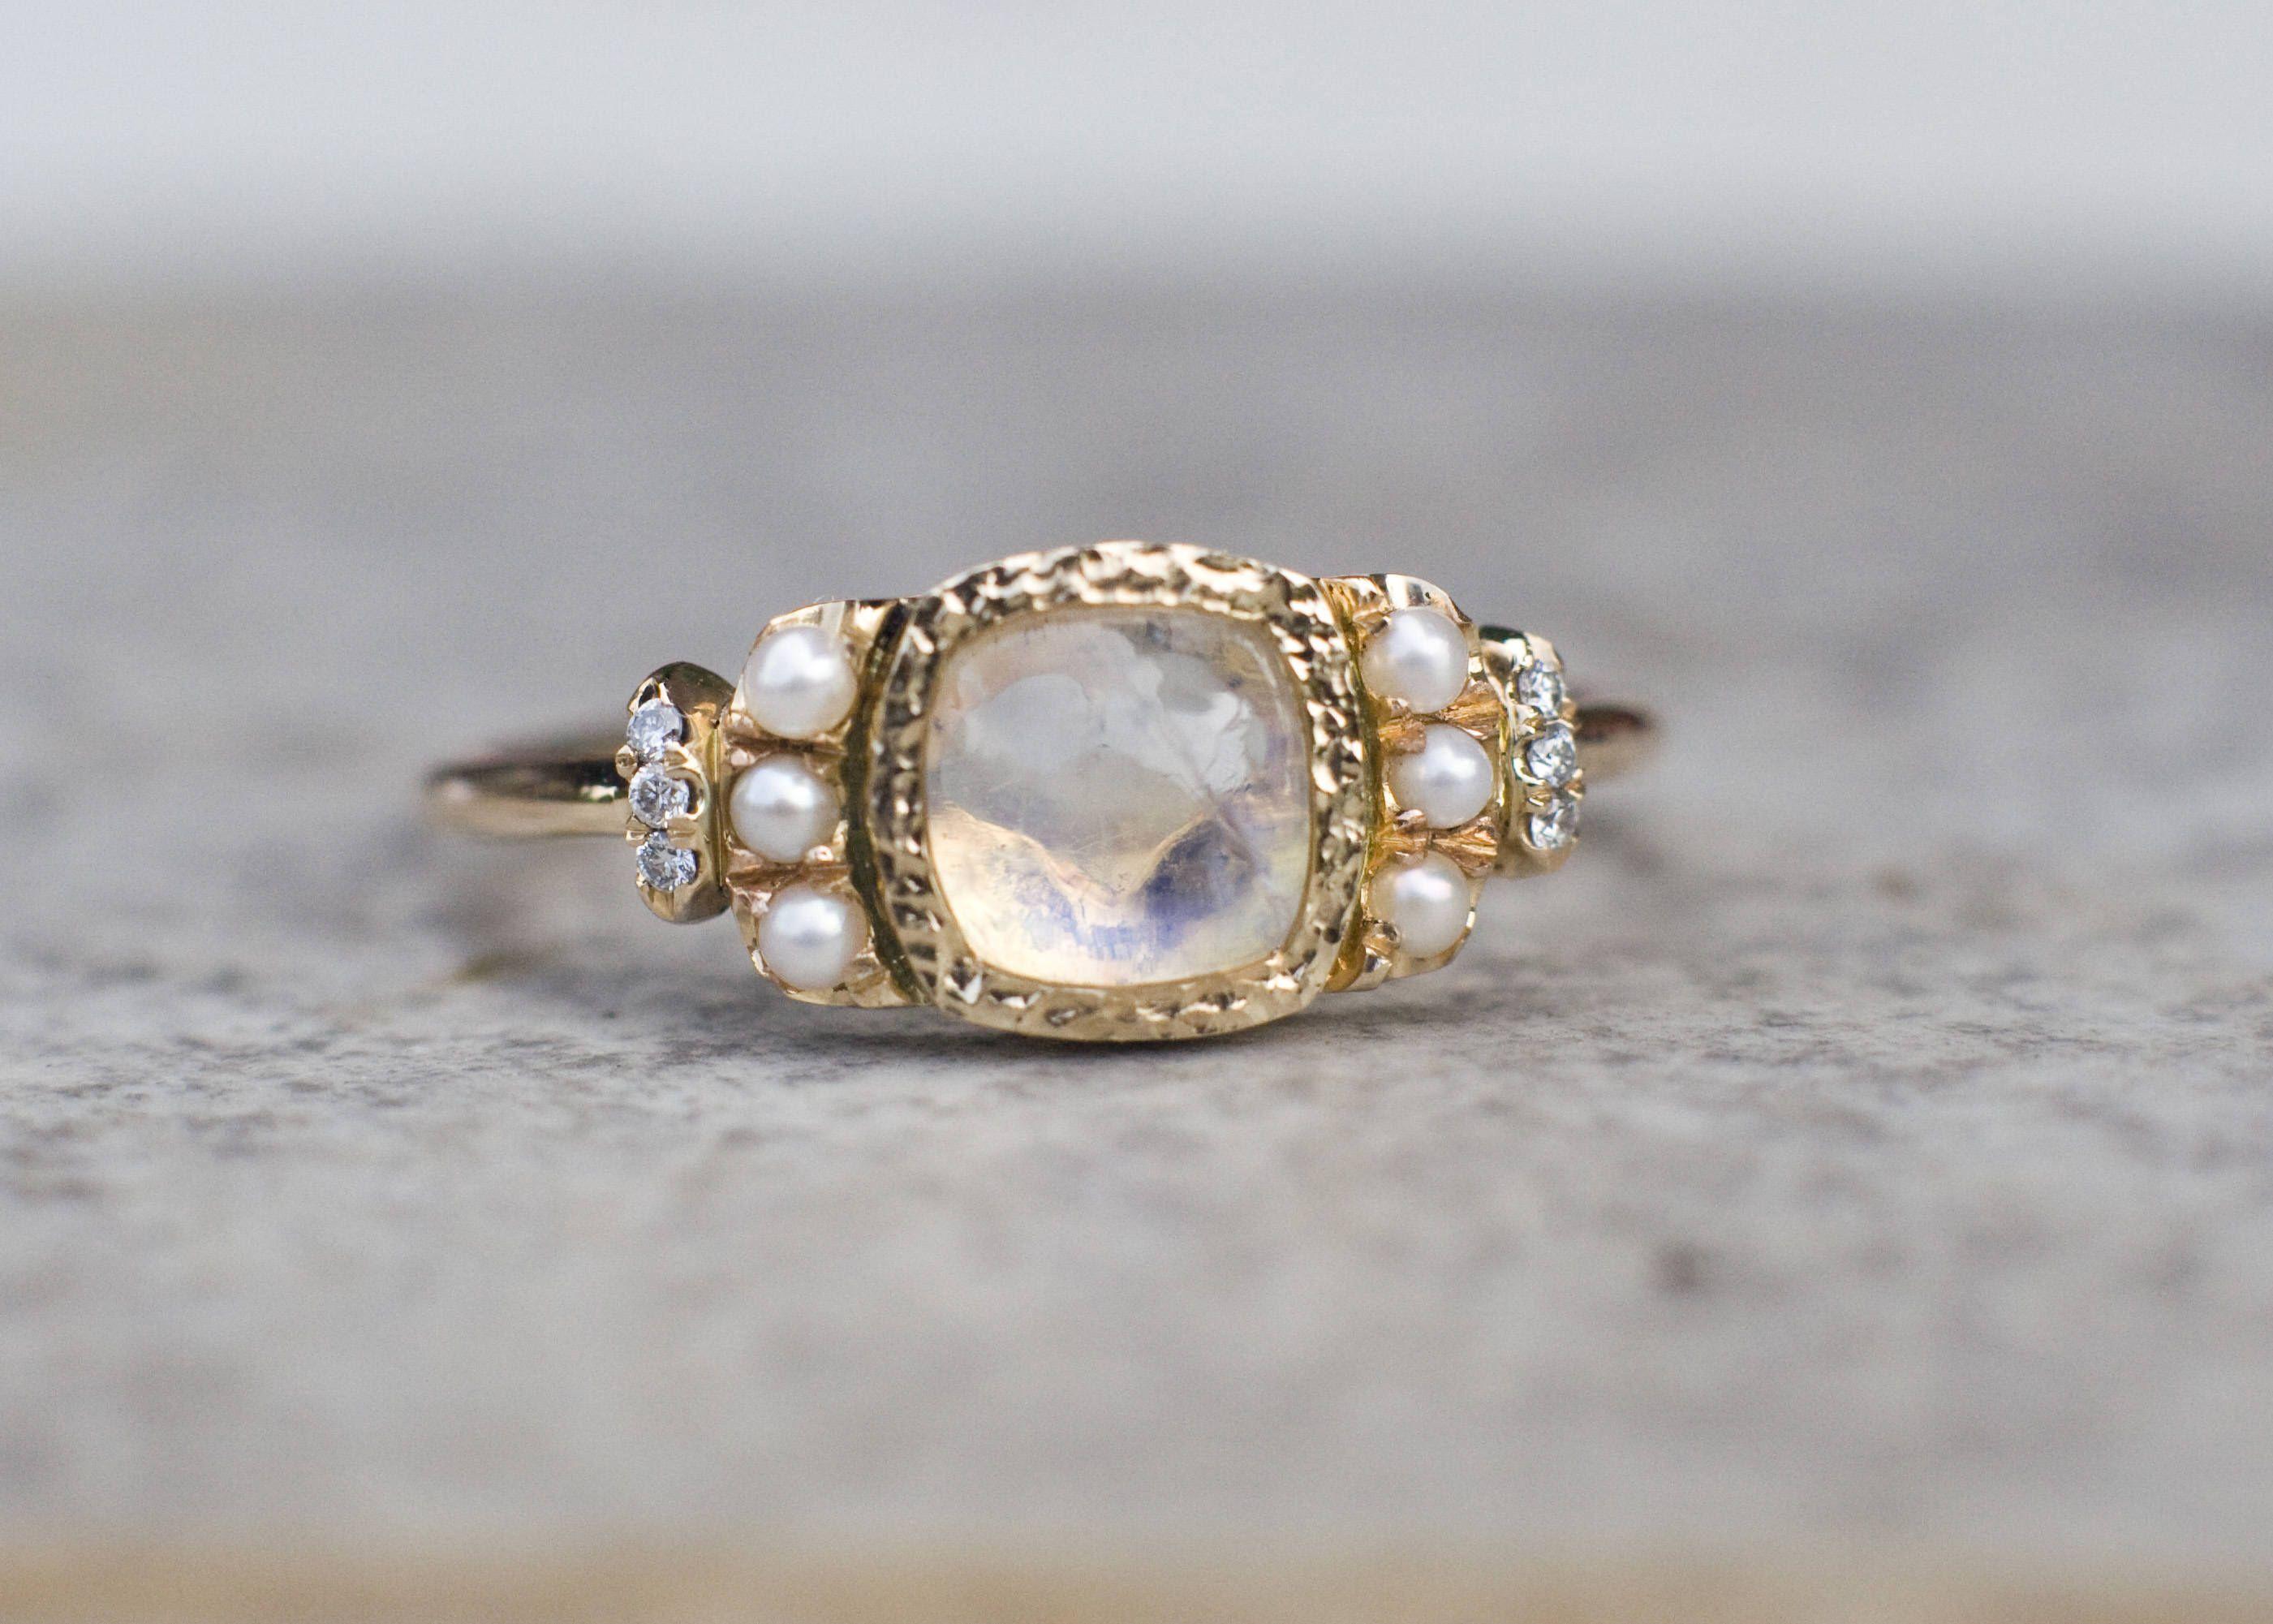 Moonstone engagement ring diamond ring multistone ring vintage